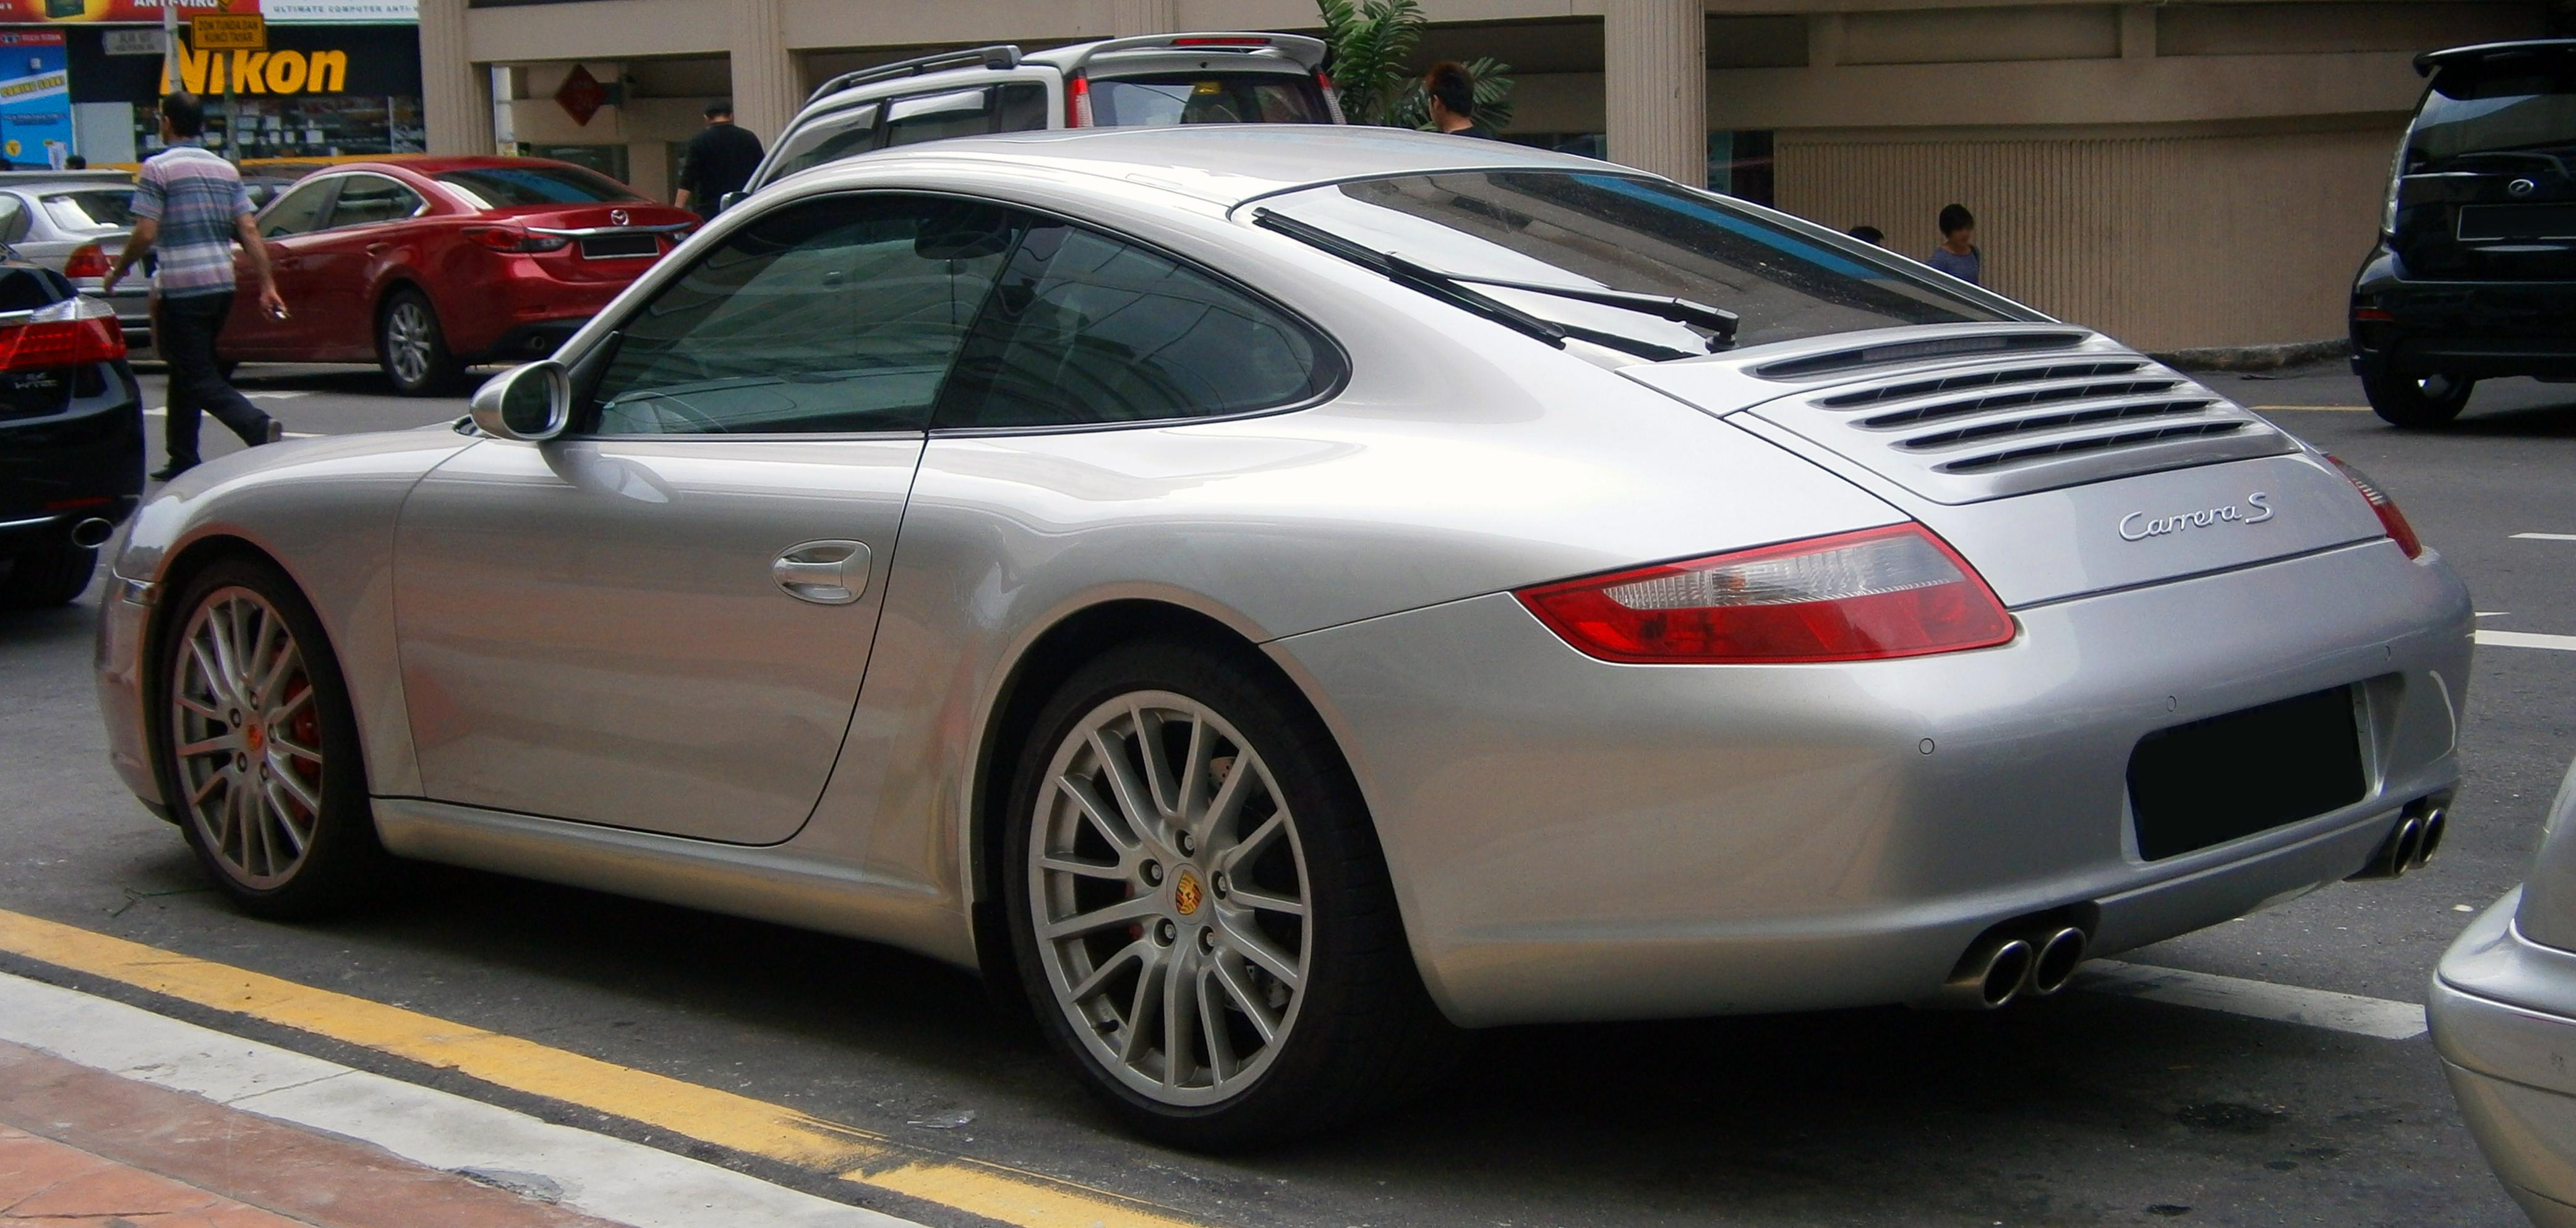 File 2004 2008 Porsche 911 997 Carrera S In Petaling